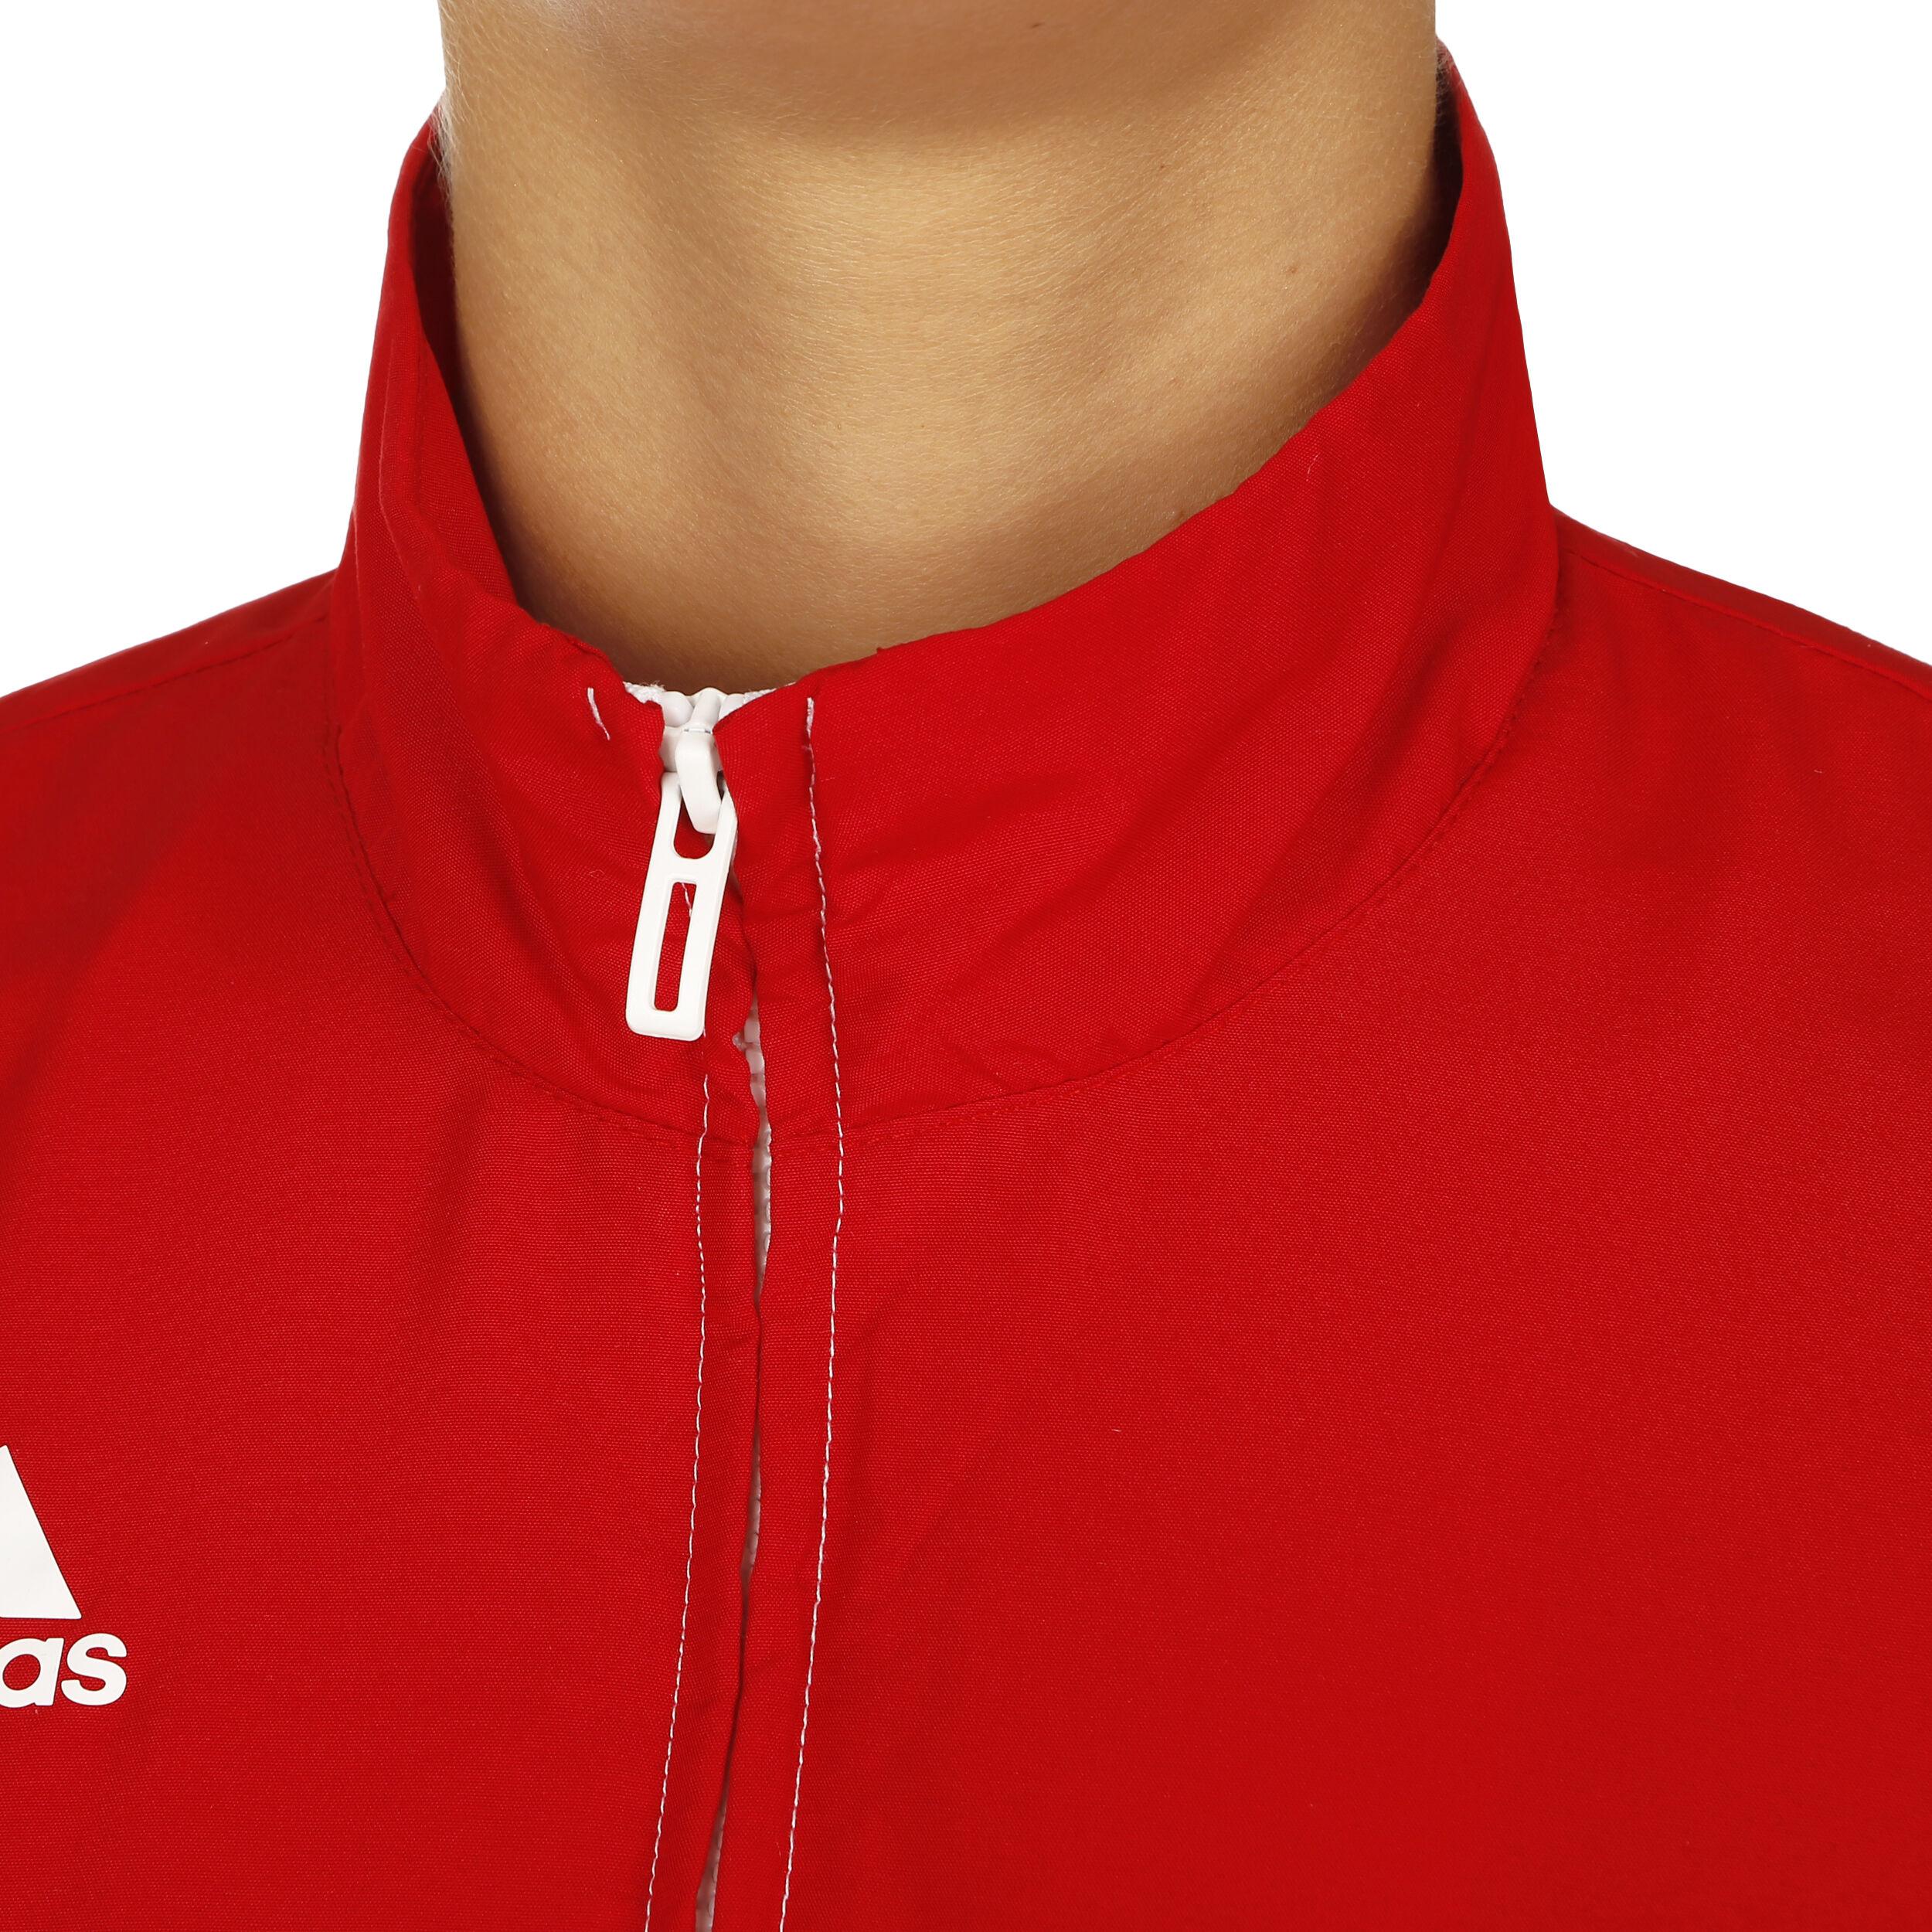 adidas T16 Hoody Trainingsjacke Kinder Rot, Weiß online